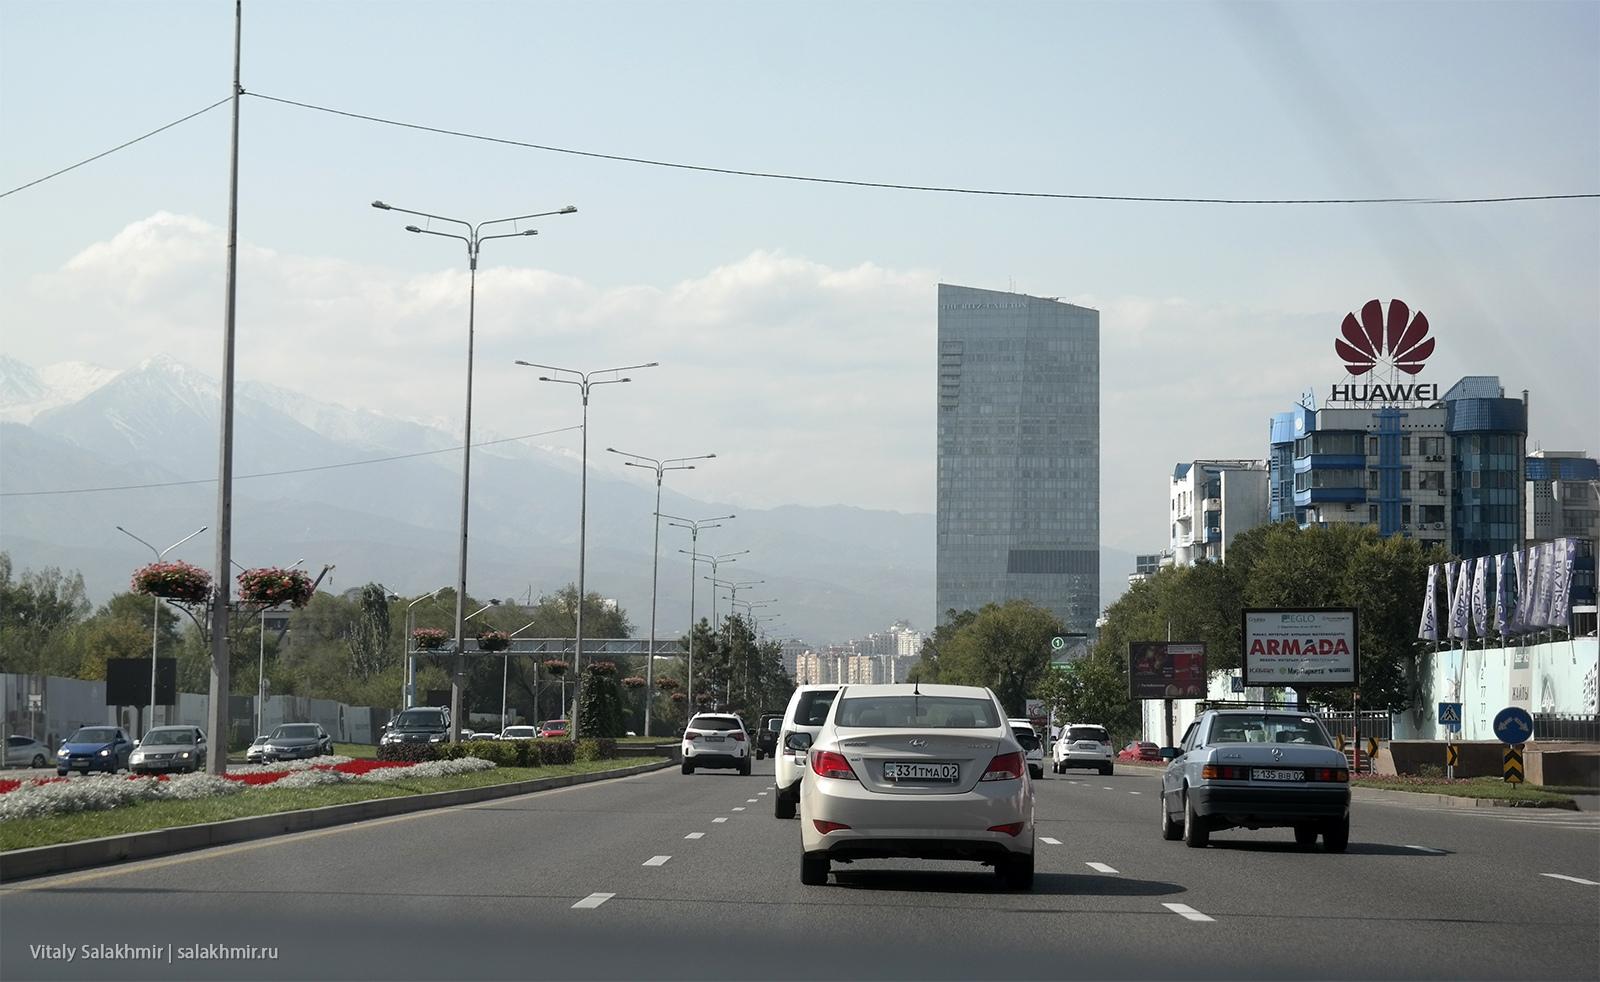 Проспект Аль-Фараби, фото 2019